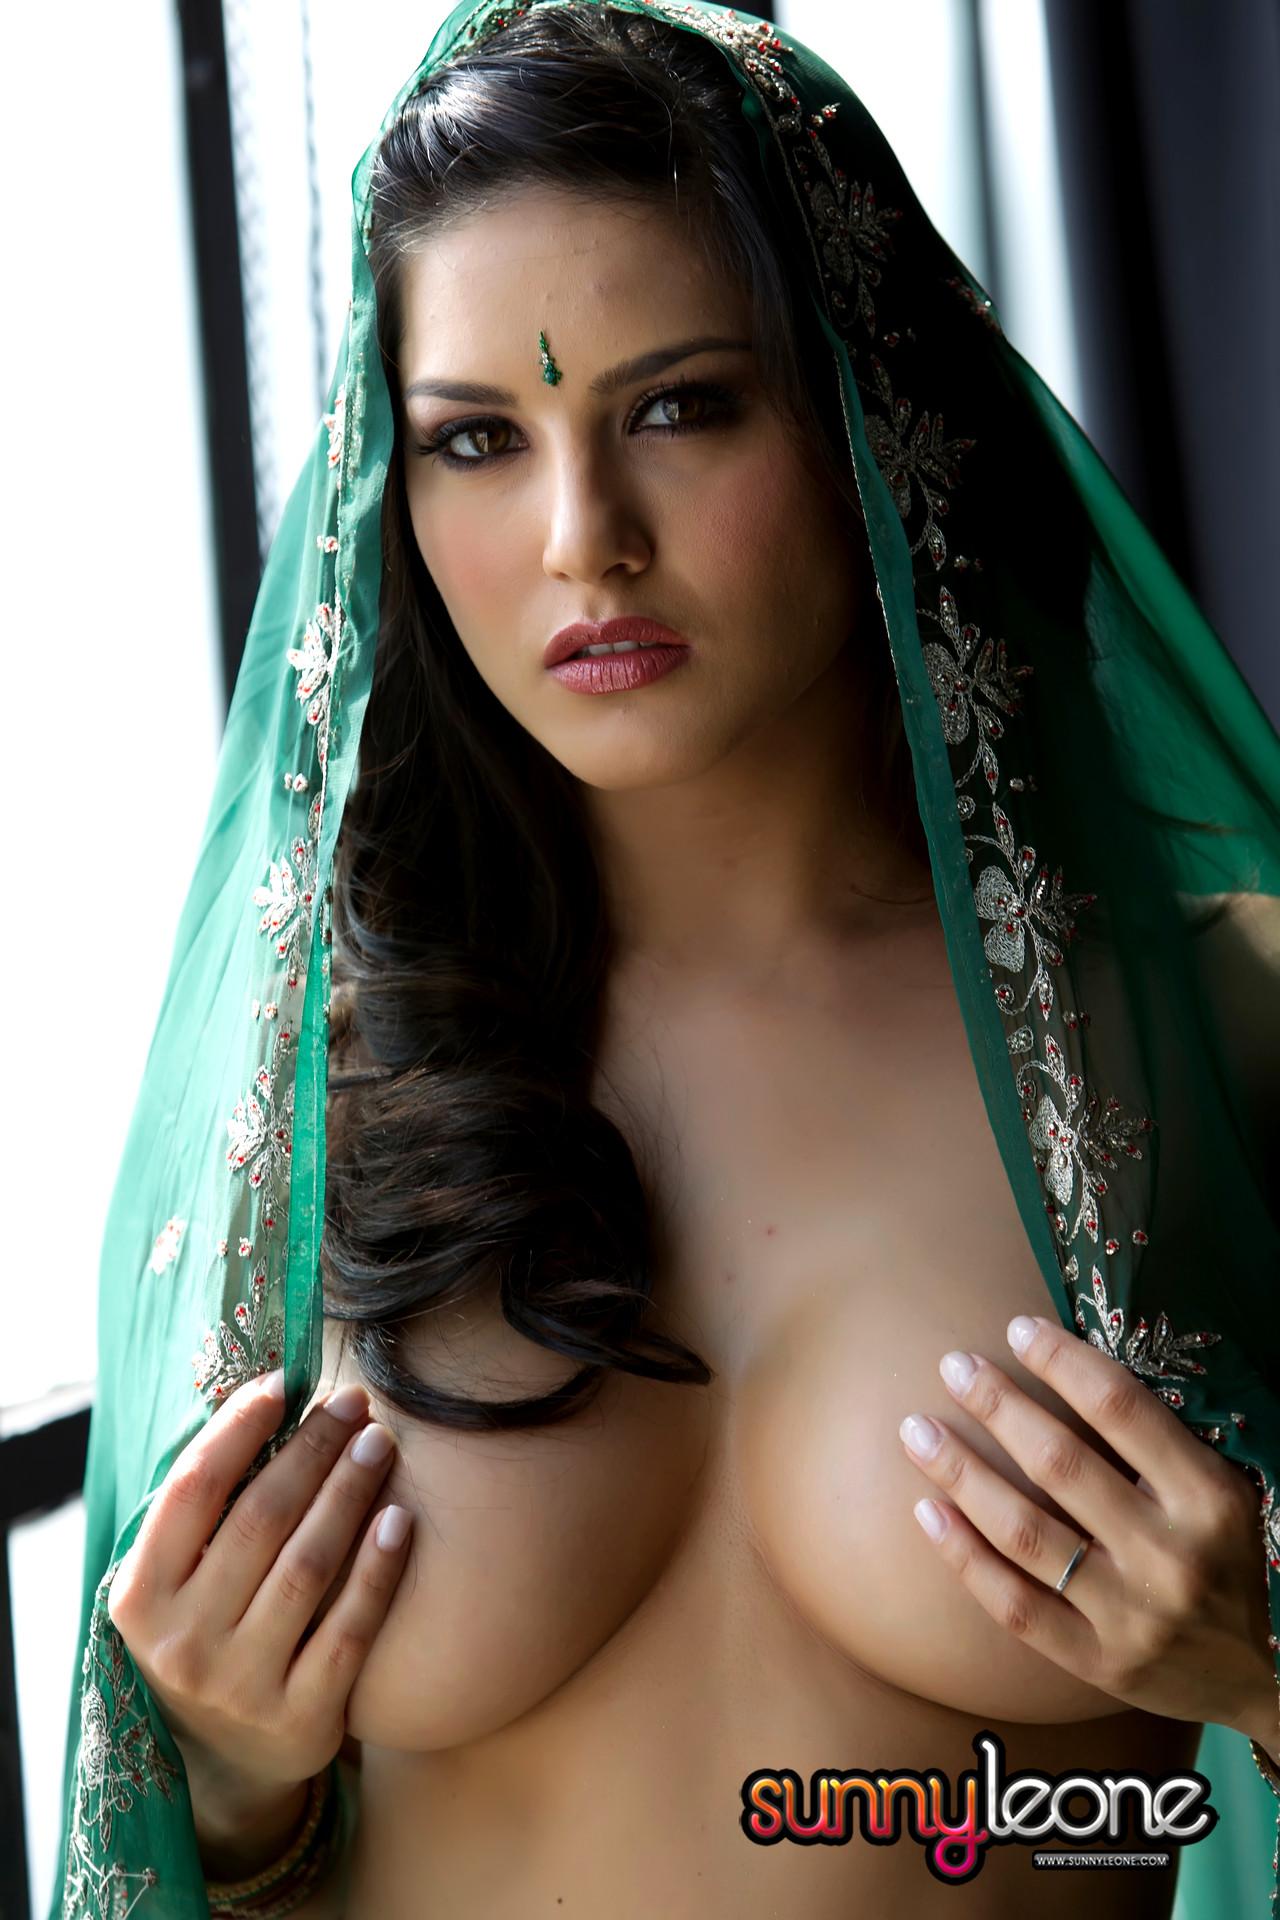 Babe Today Sunny Leone Sunny Leone Amazing Big Tits Hdbabe -7583